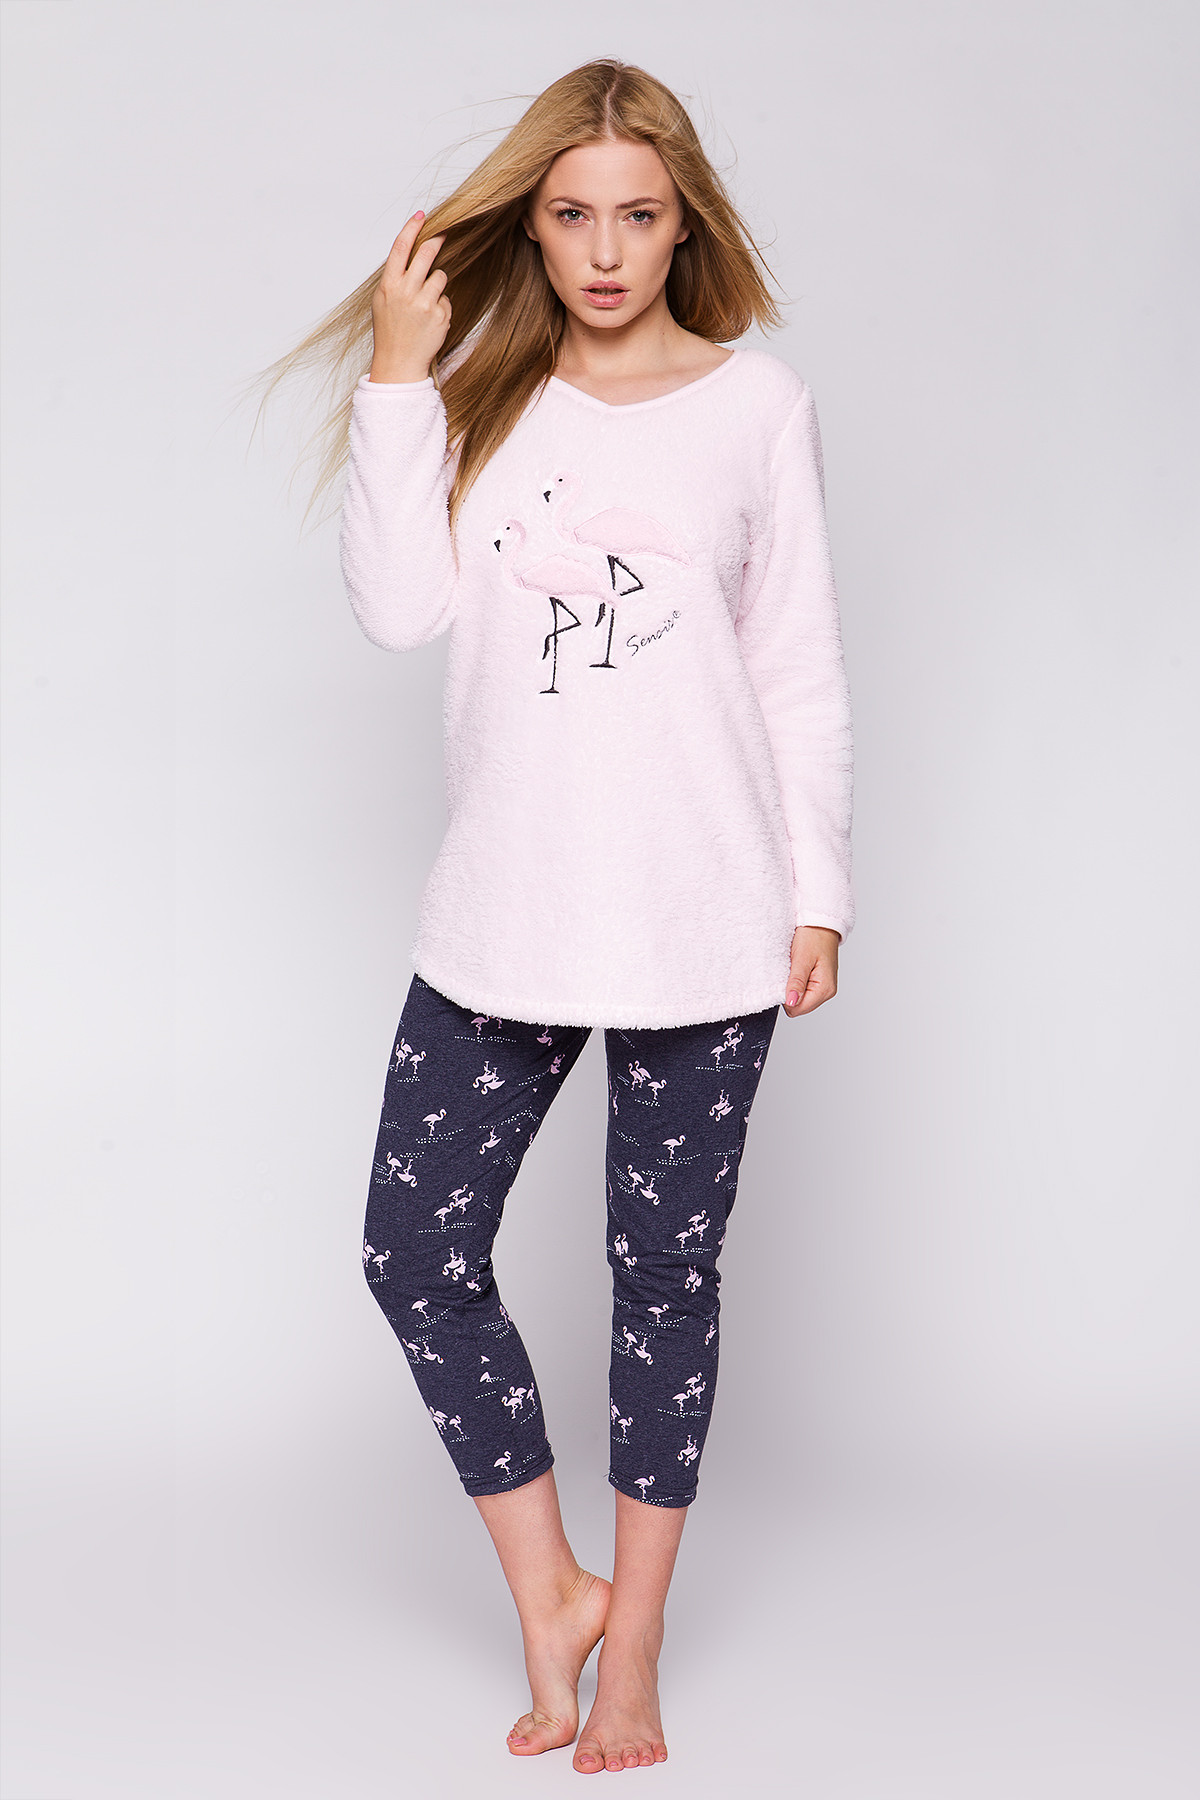 4ca4040c4f80a7 Piżama Sensis Soft Flaming+legginsy dł/r - Bielizna damska - piżamy ...